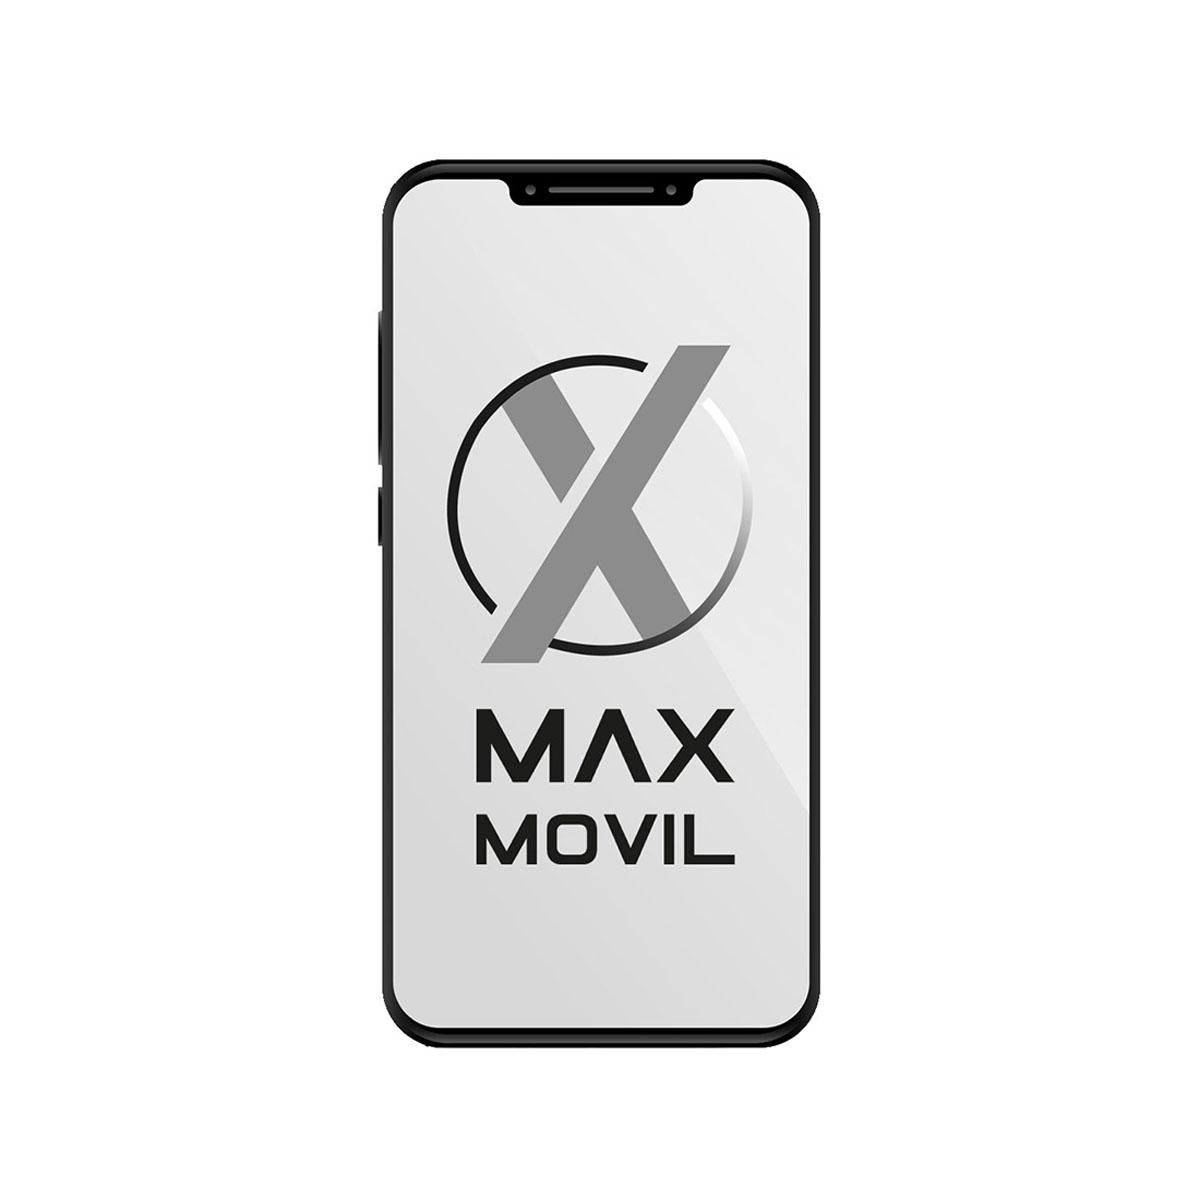 Tapa de bateria Sony Ericsson Xperia X10 Mini blanca